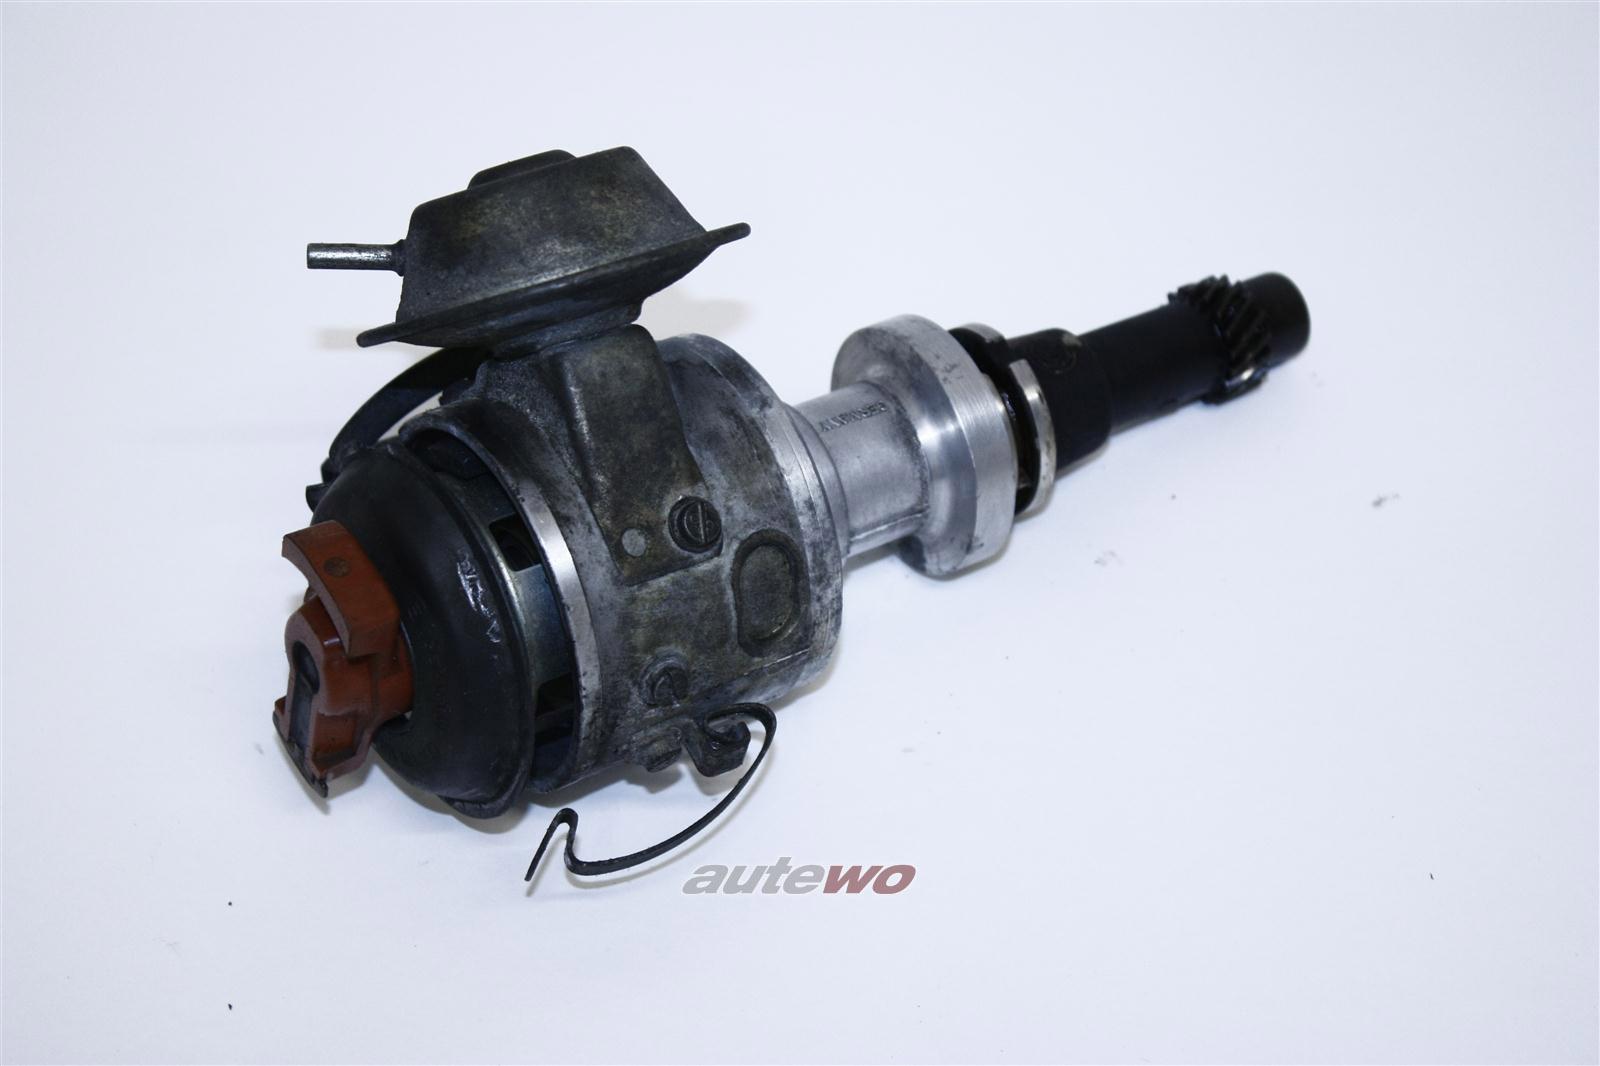 Audi 90 Typ 81/85/100 Typ 44 2.2l 115-120PS Zündverteiler 034905205F 0237030021